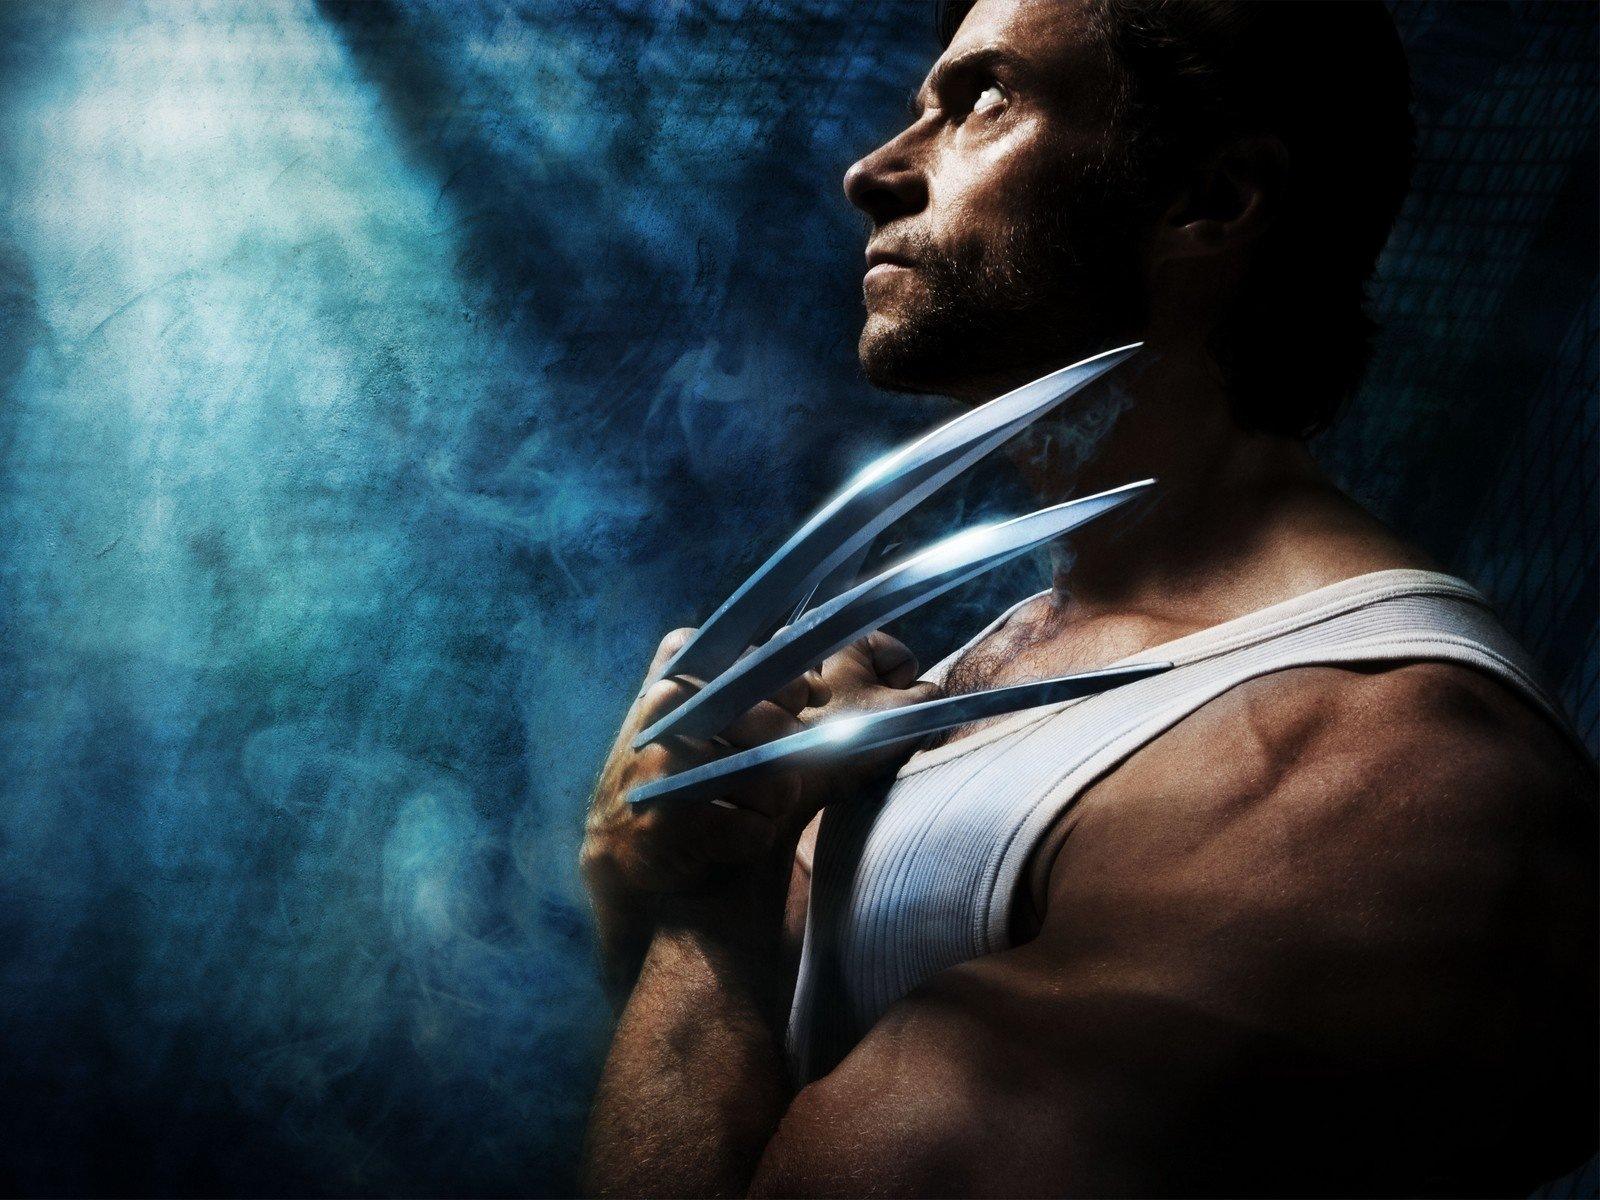 Wallpapers X Men Origins Wolverine Game Wallpaper 1600x1200